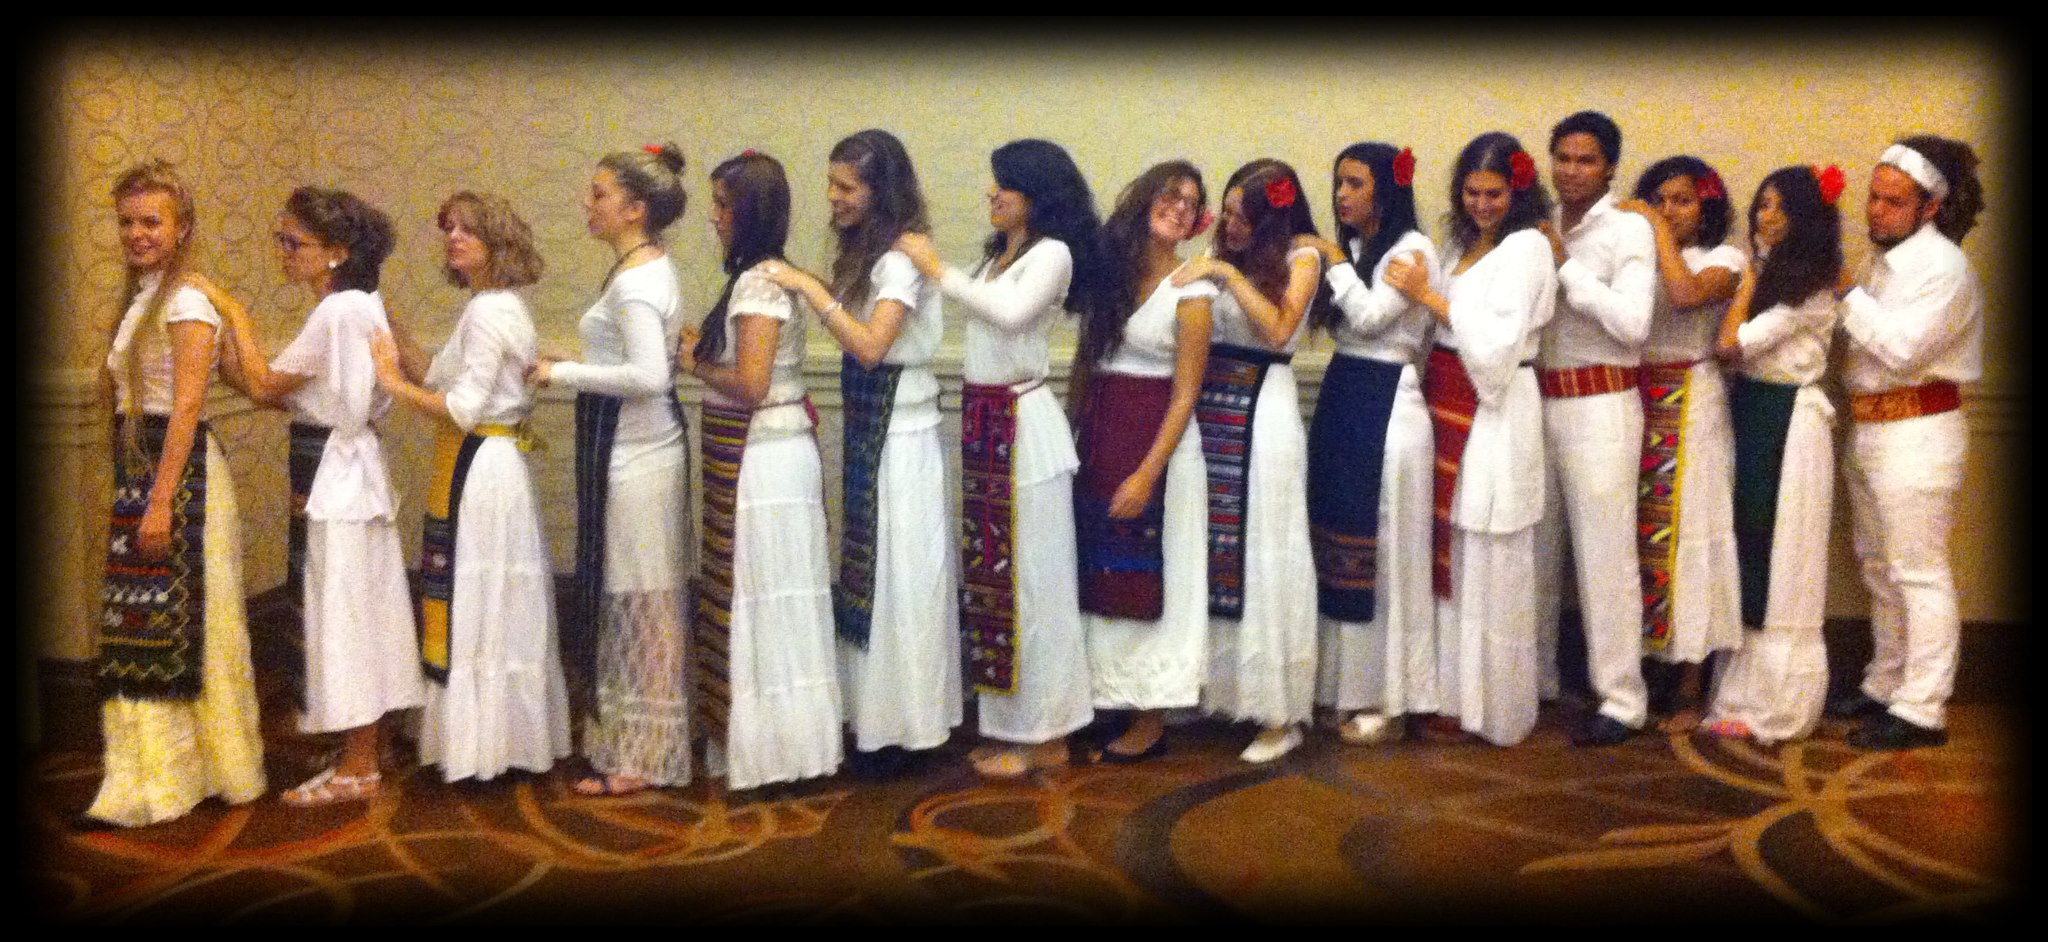 Balkan Choir, Opening Day, 9/12